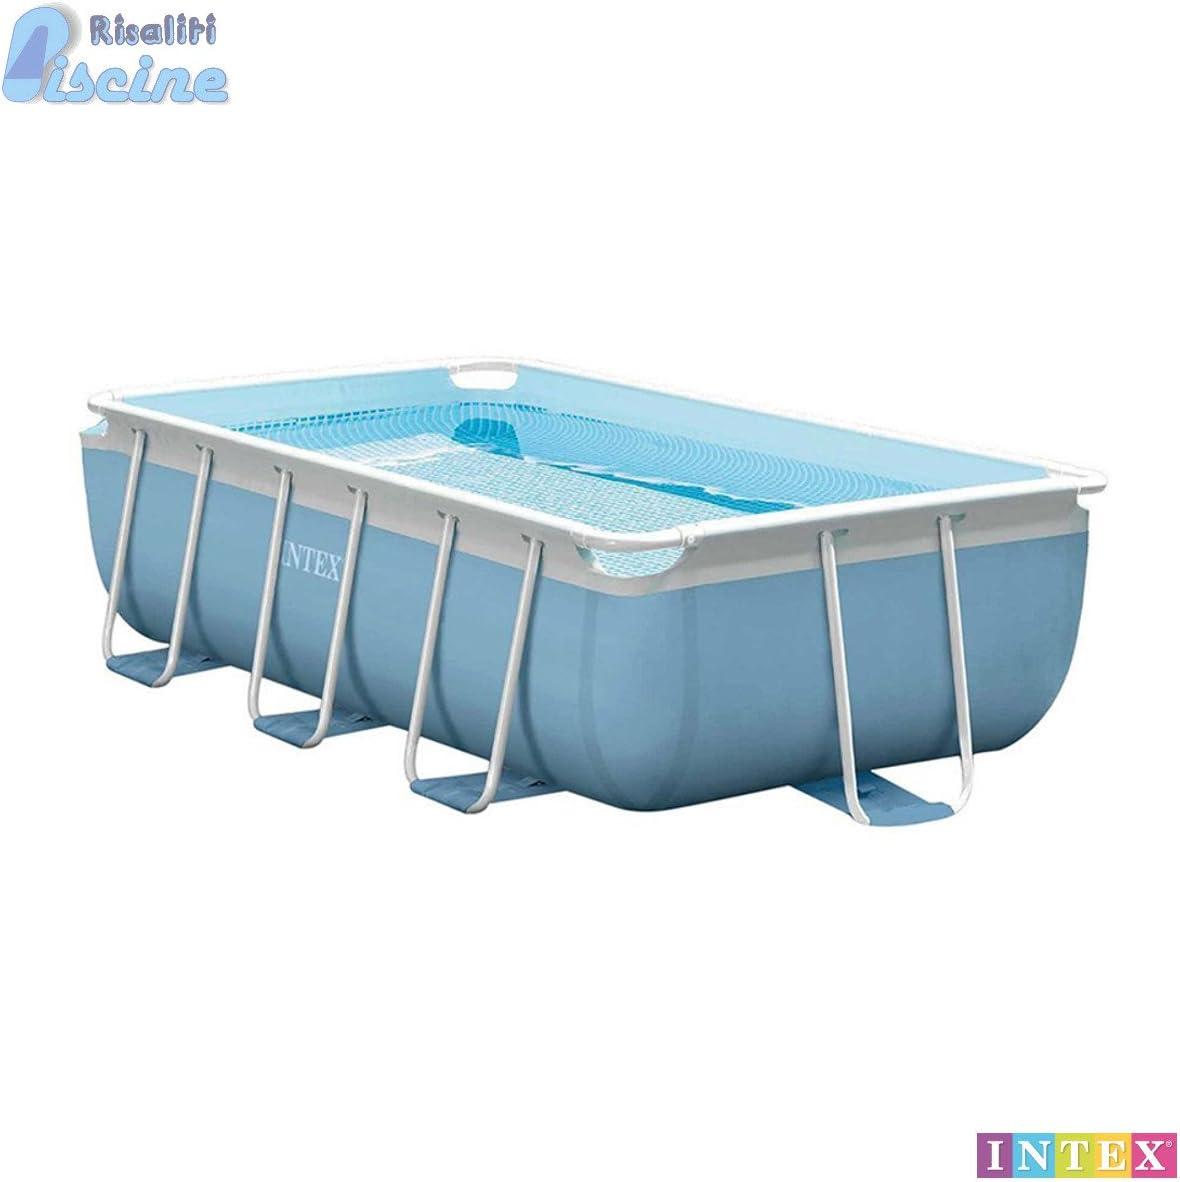 26772 piscina Prism Metal Frame rectangular cm 300 x 175 x L080, Bomba Filtro de cartucho de 2006 l/h y escalera: Amazon.es: Jardín